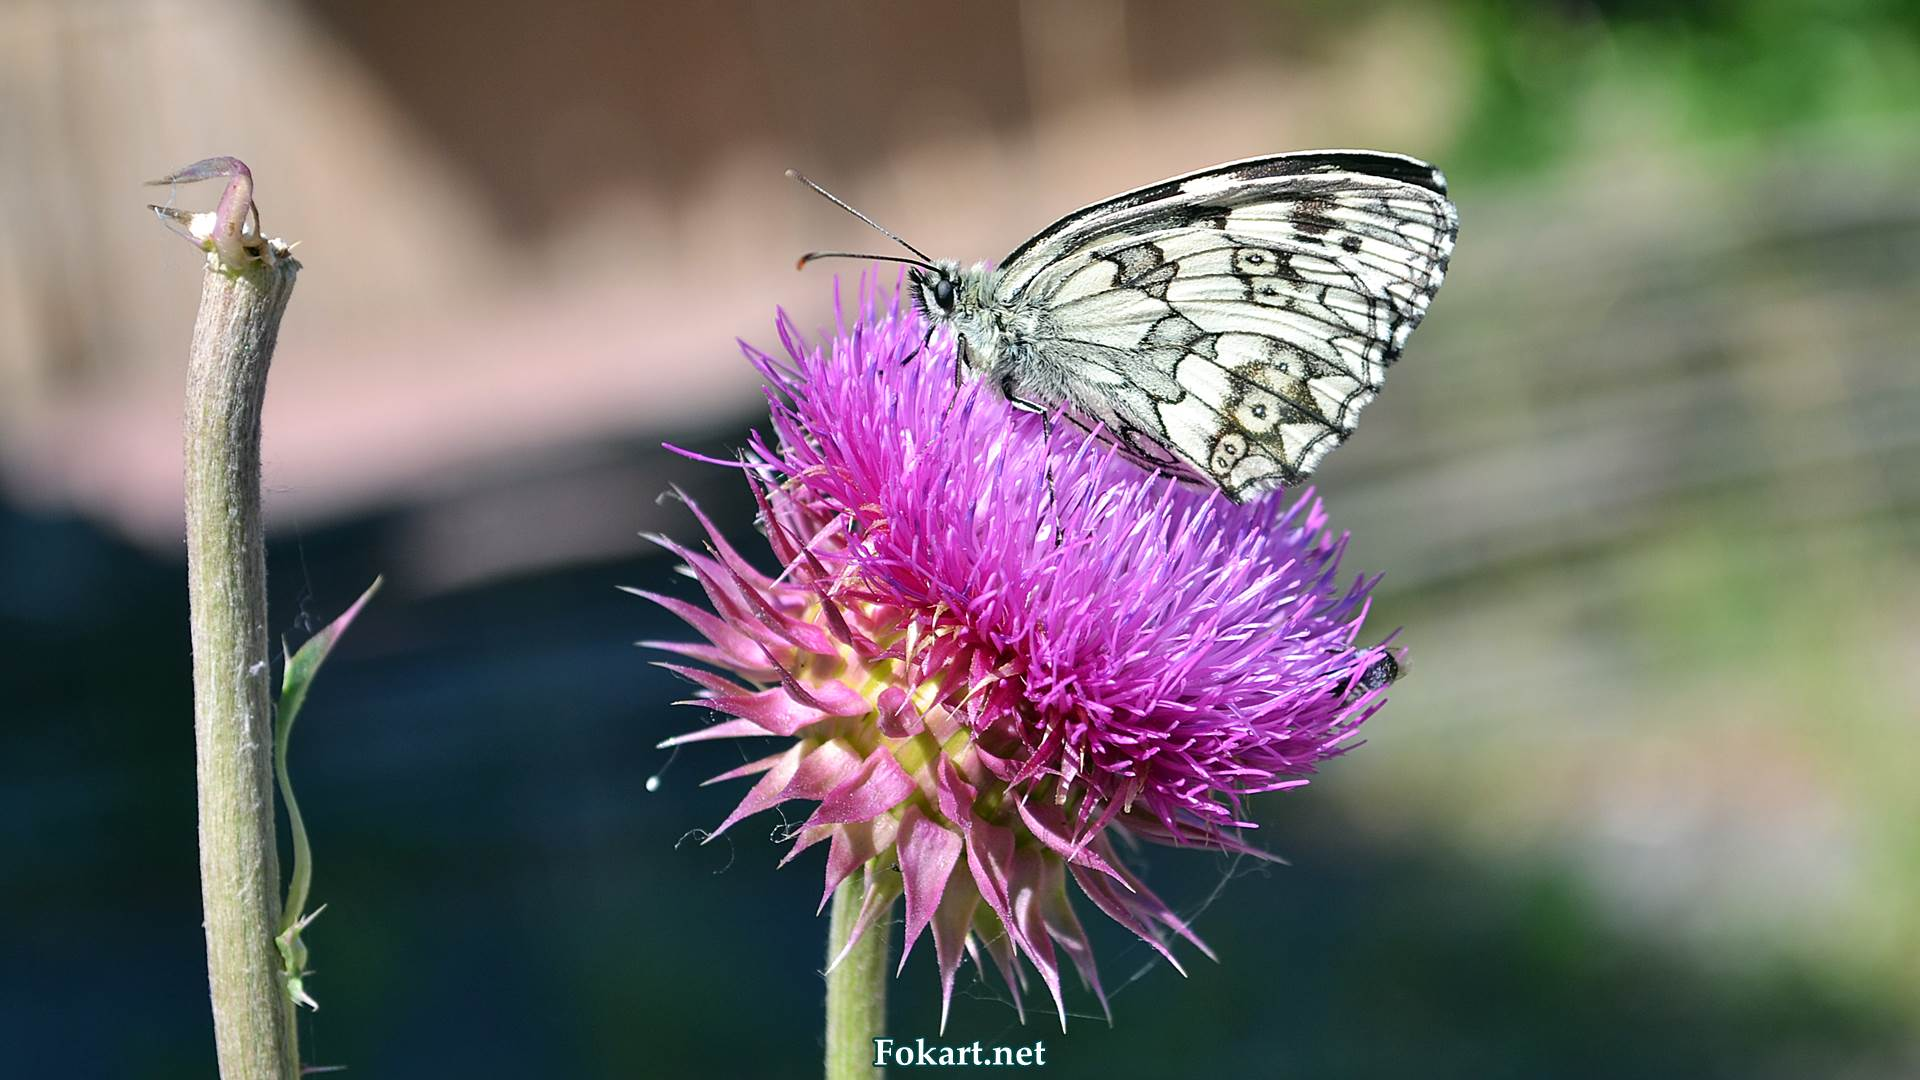 Пестроглазка галатея на цветке, фото 3